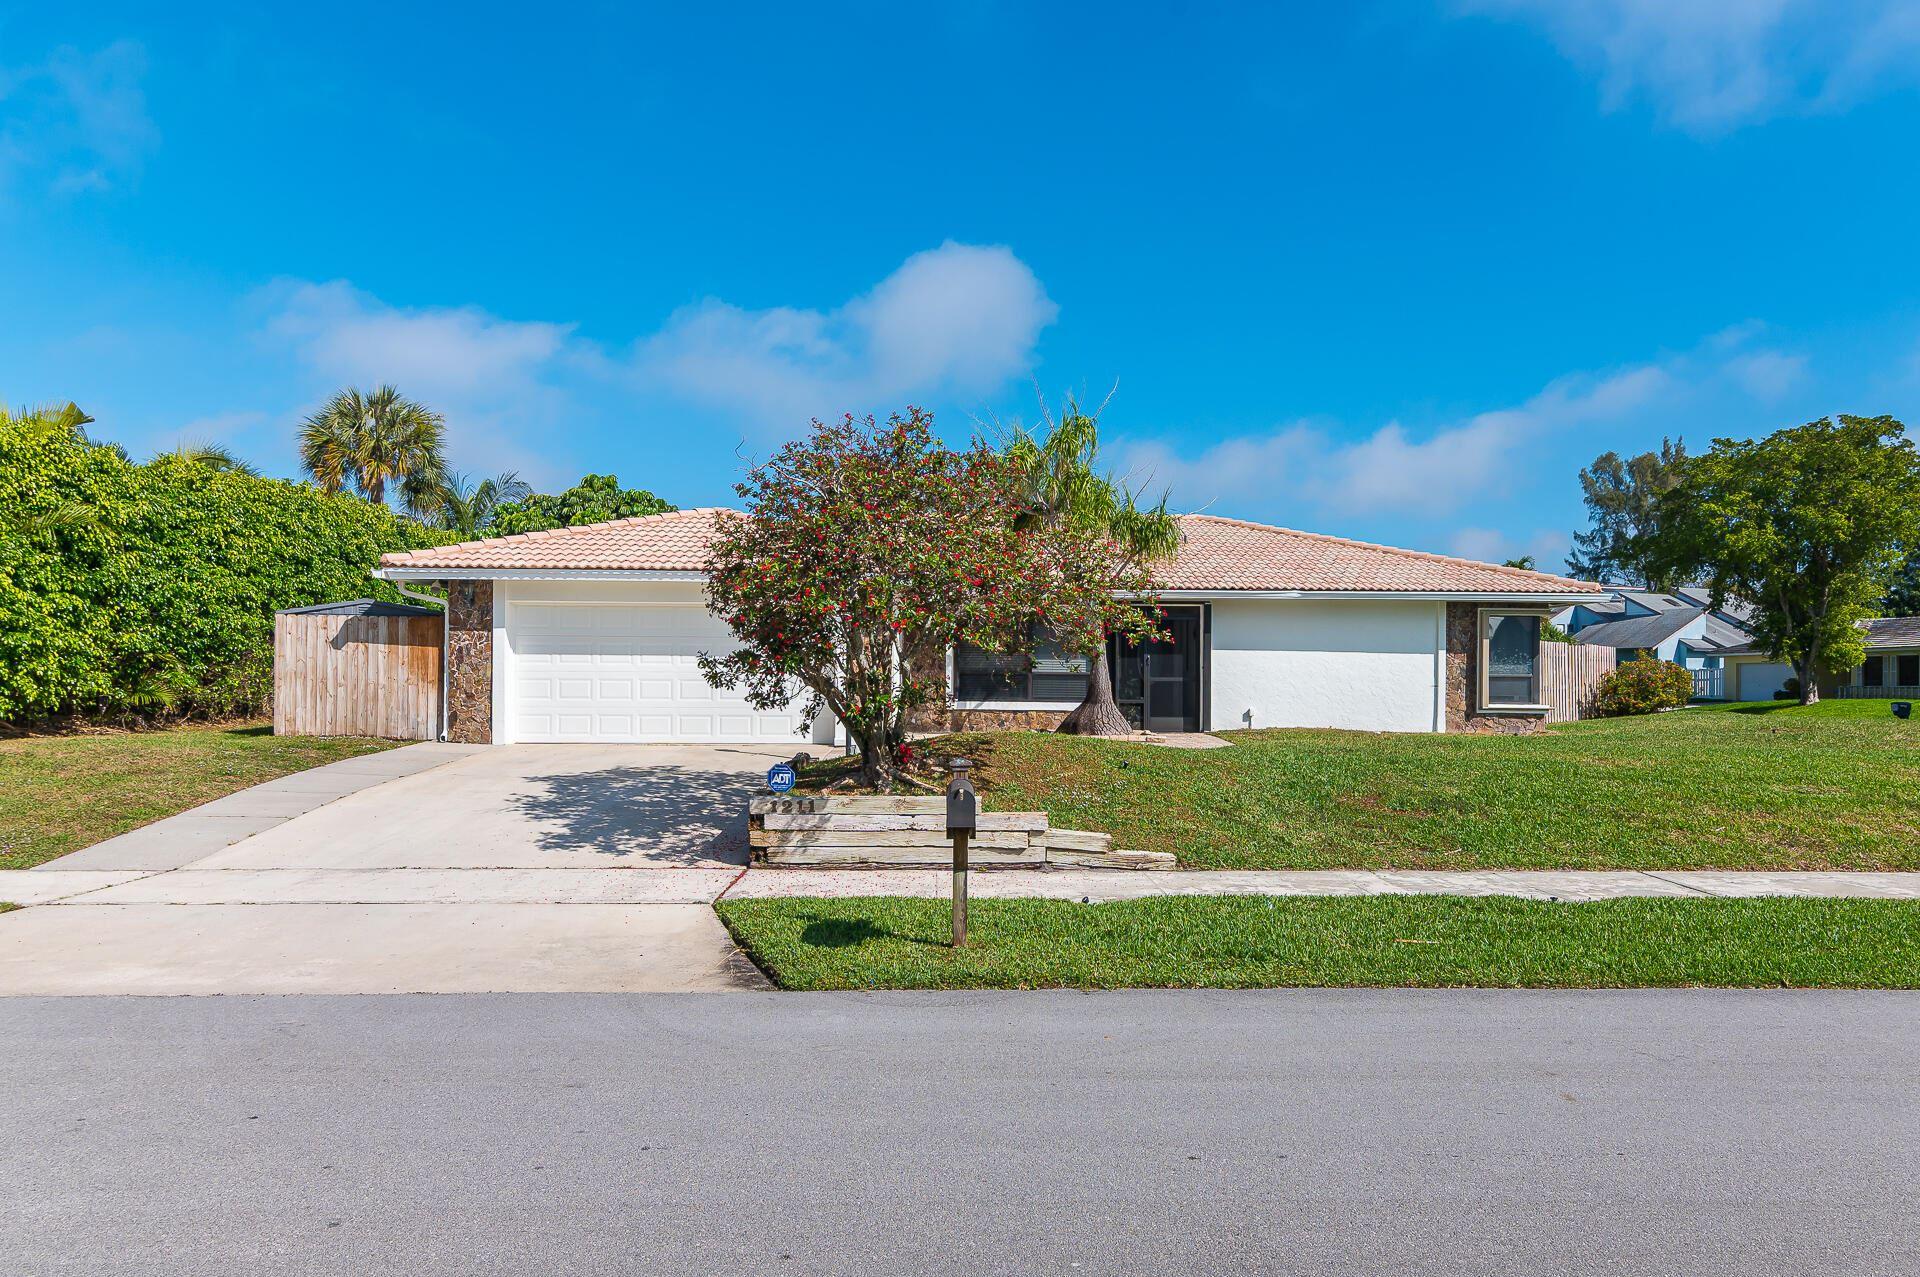 1211 NW 15th Street, Boca Raton, FL 33486 - #: RX-10696143